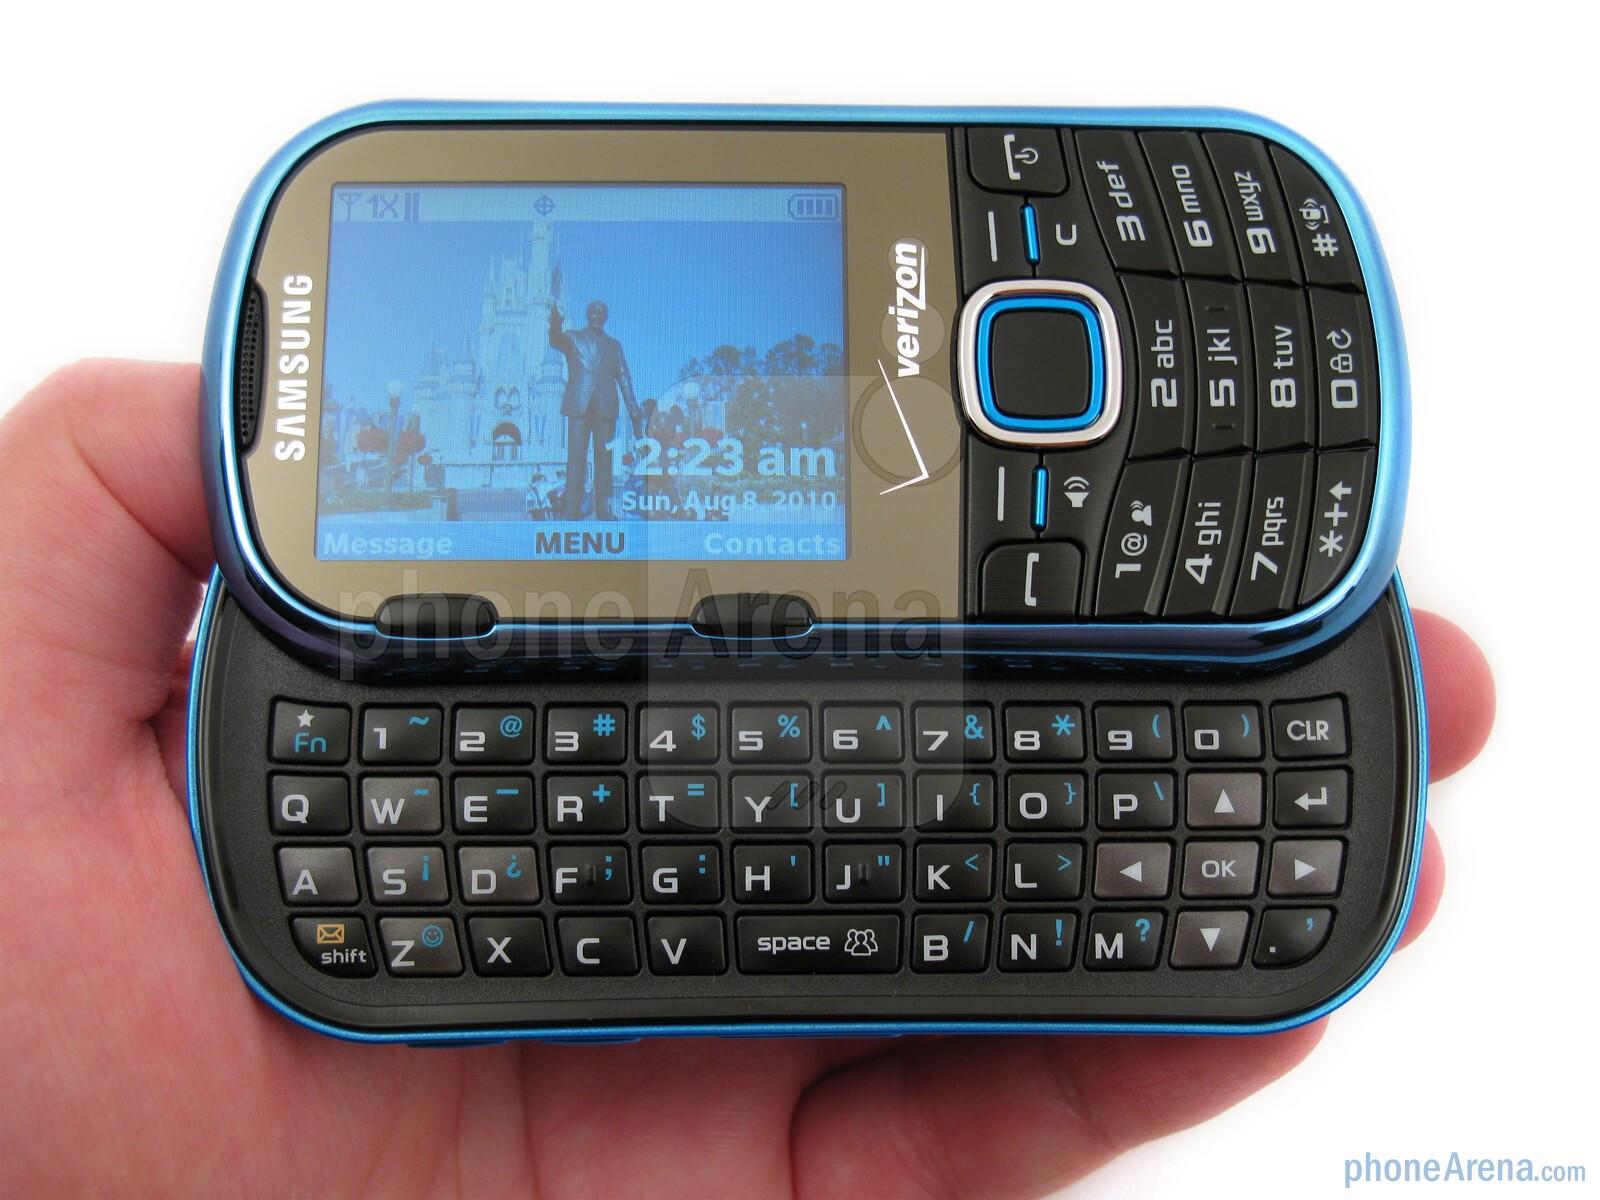 samsung intensity ii review rh phonearena com Samsung Phones Samsung Razor Cell Phone